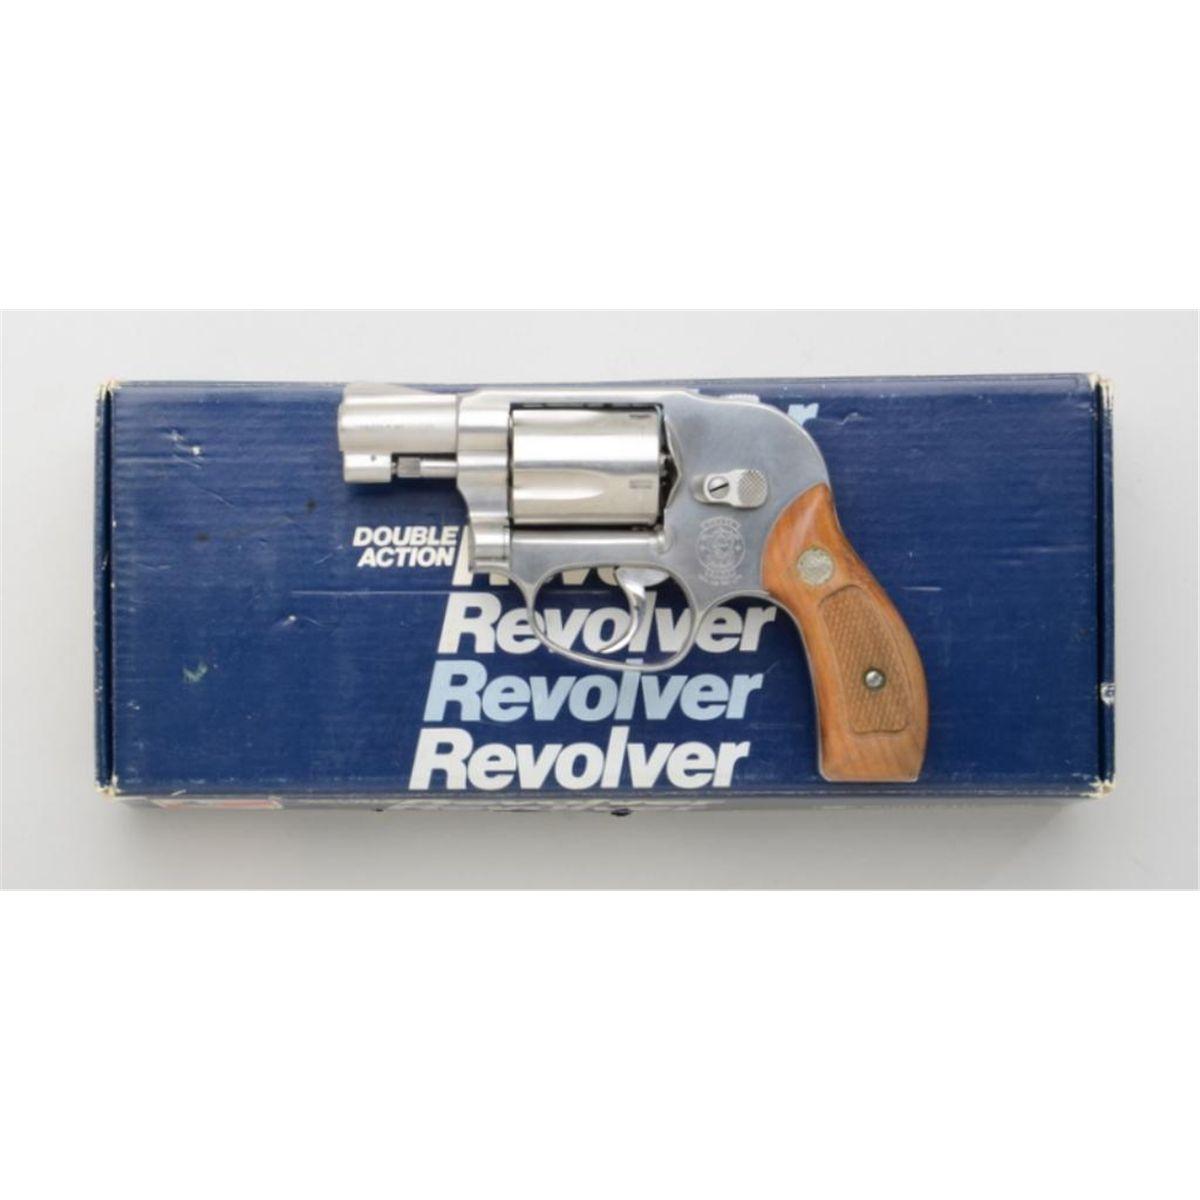 Smith & Wesson Model 649 DA concealed hammer revolver